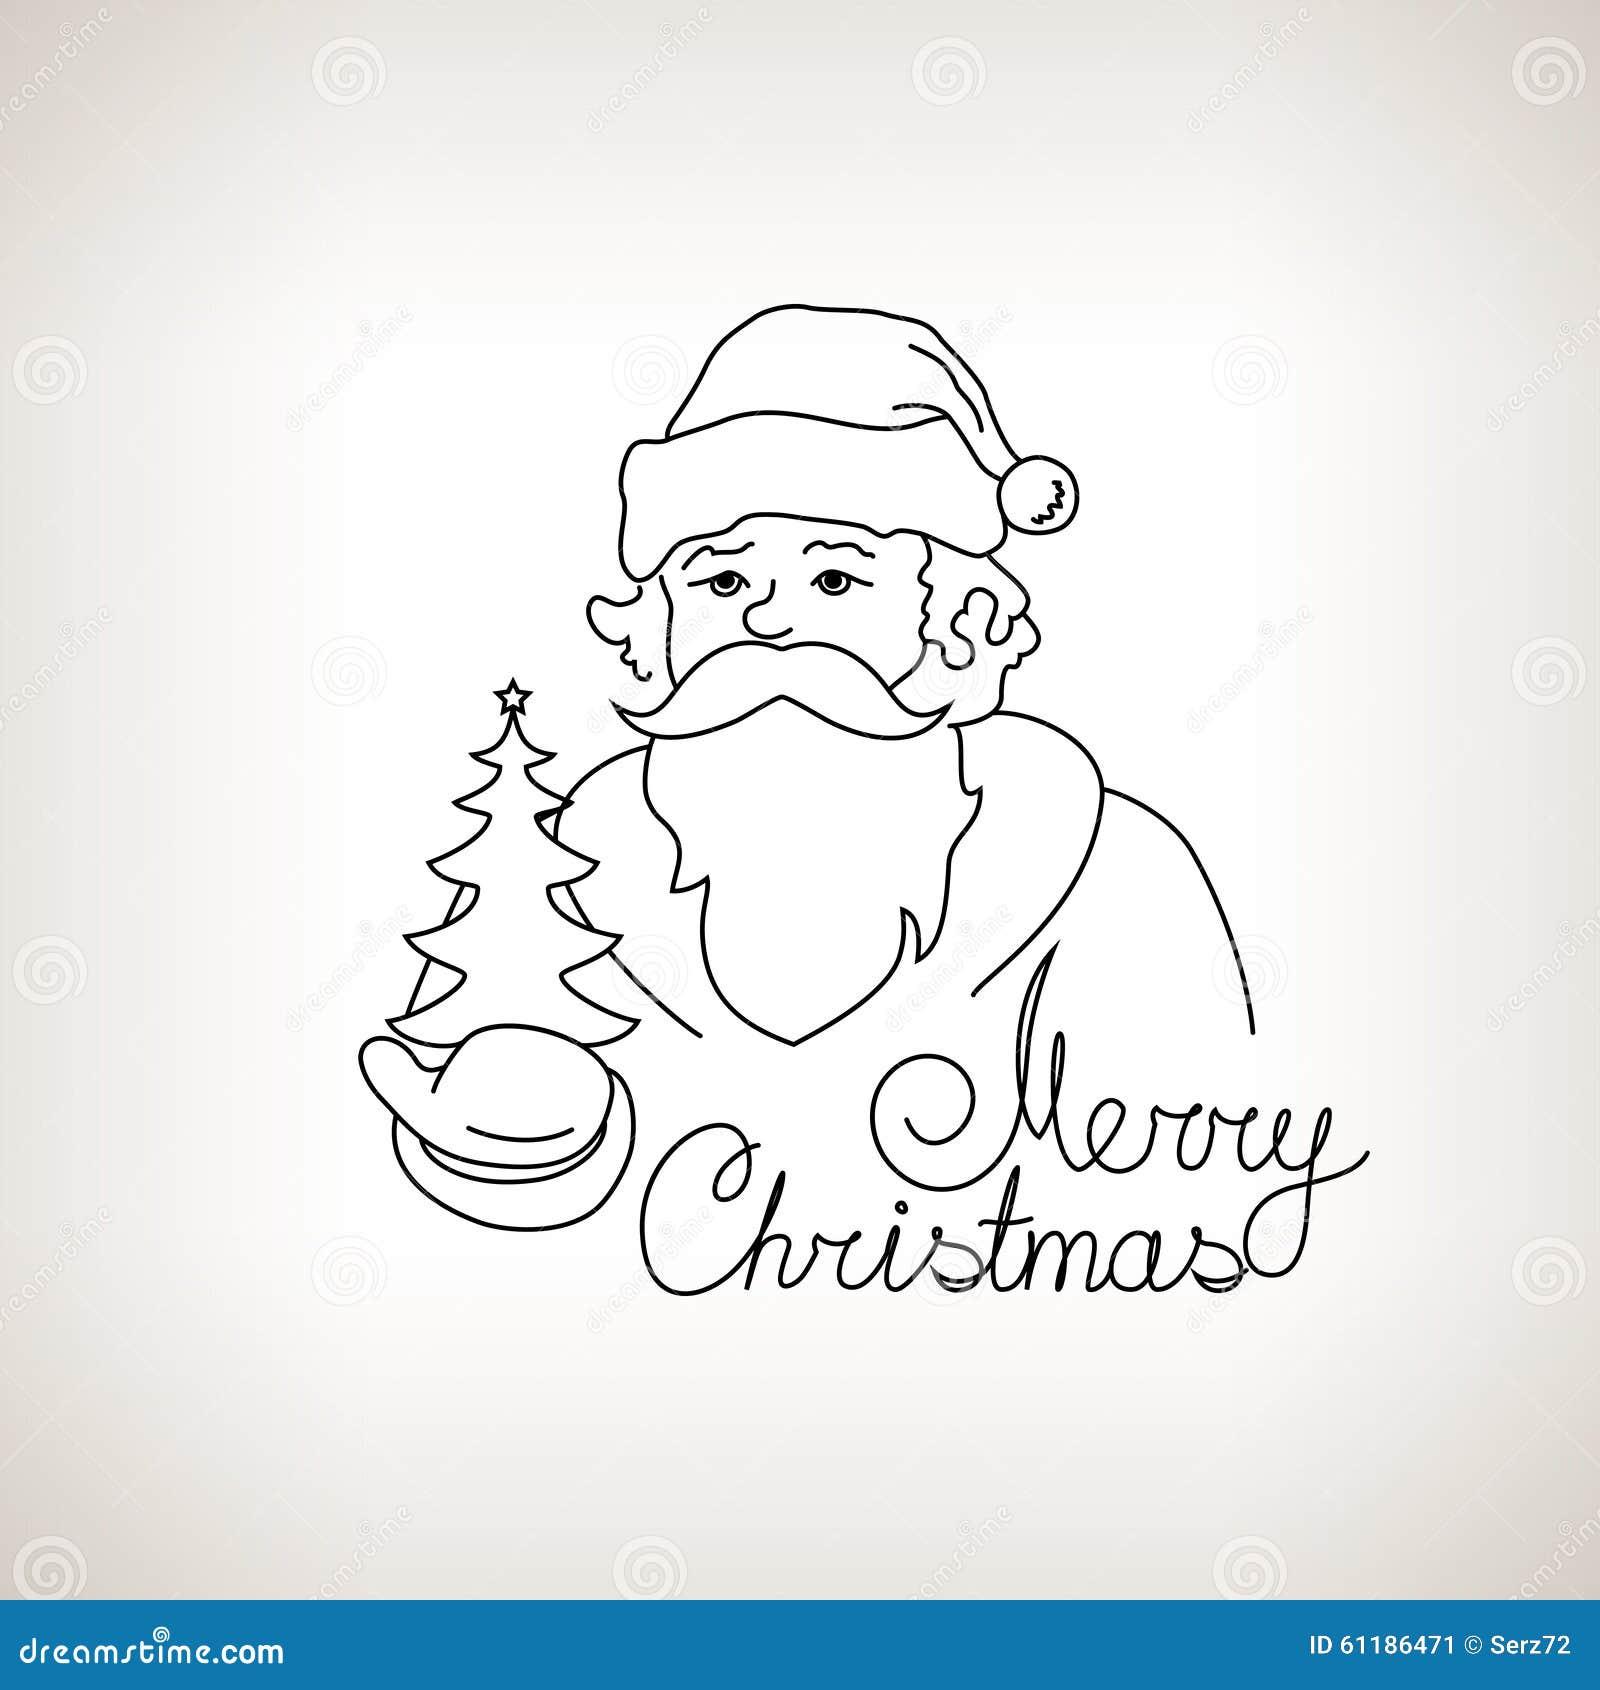 Santa claus with christmas tree sketch